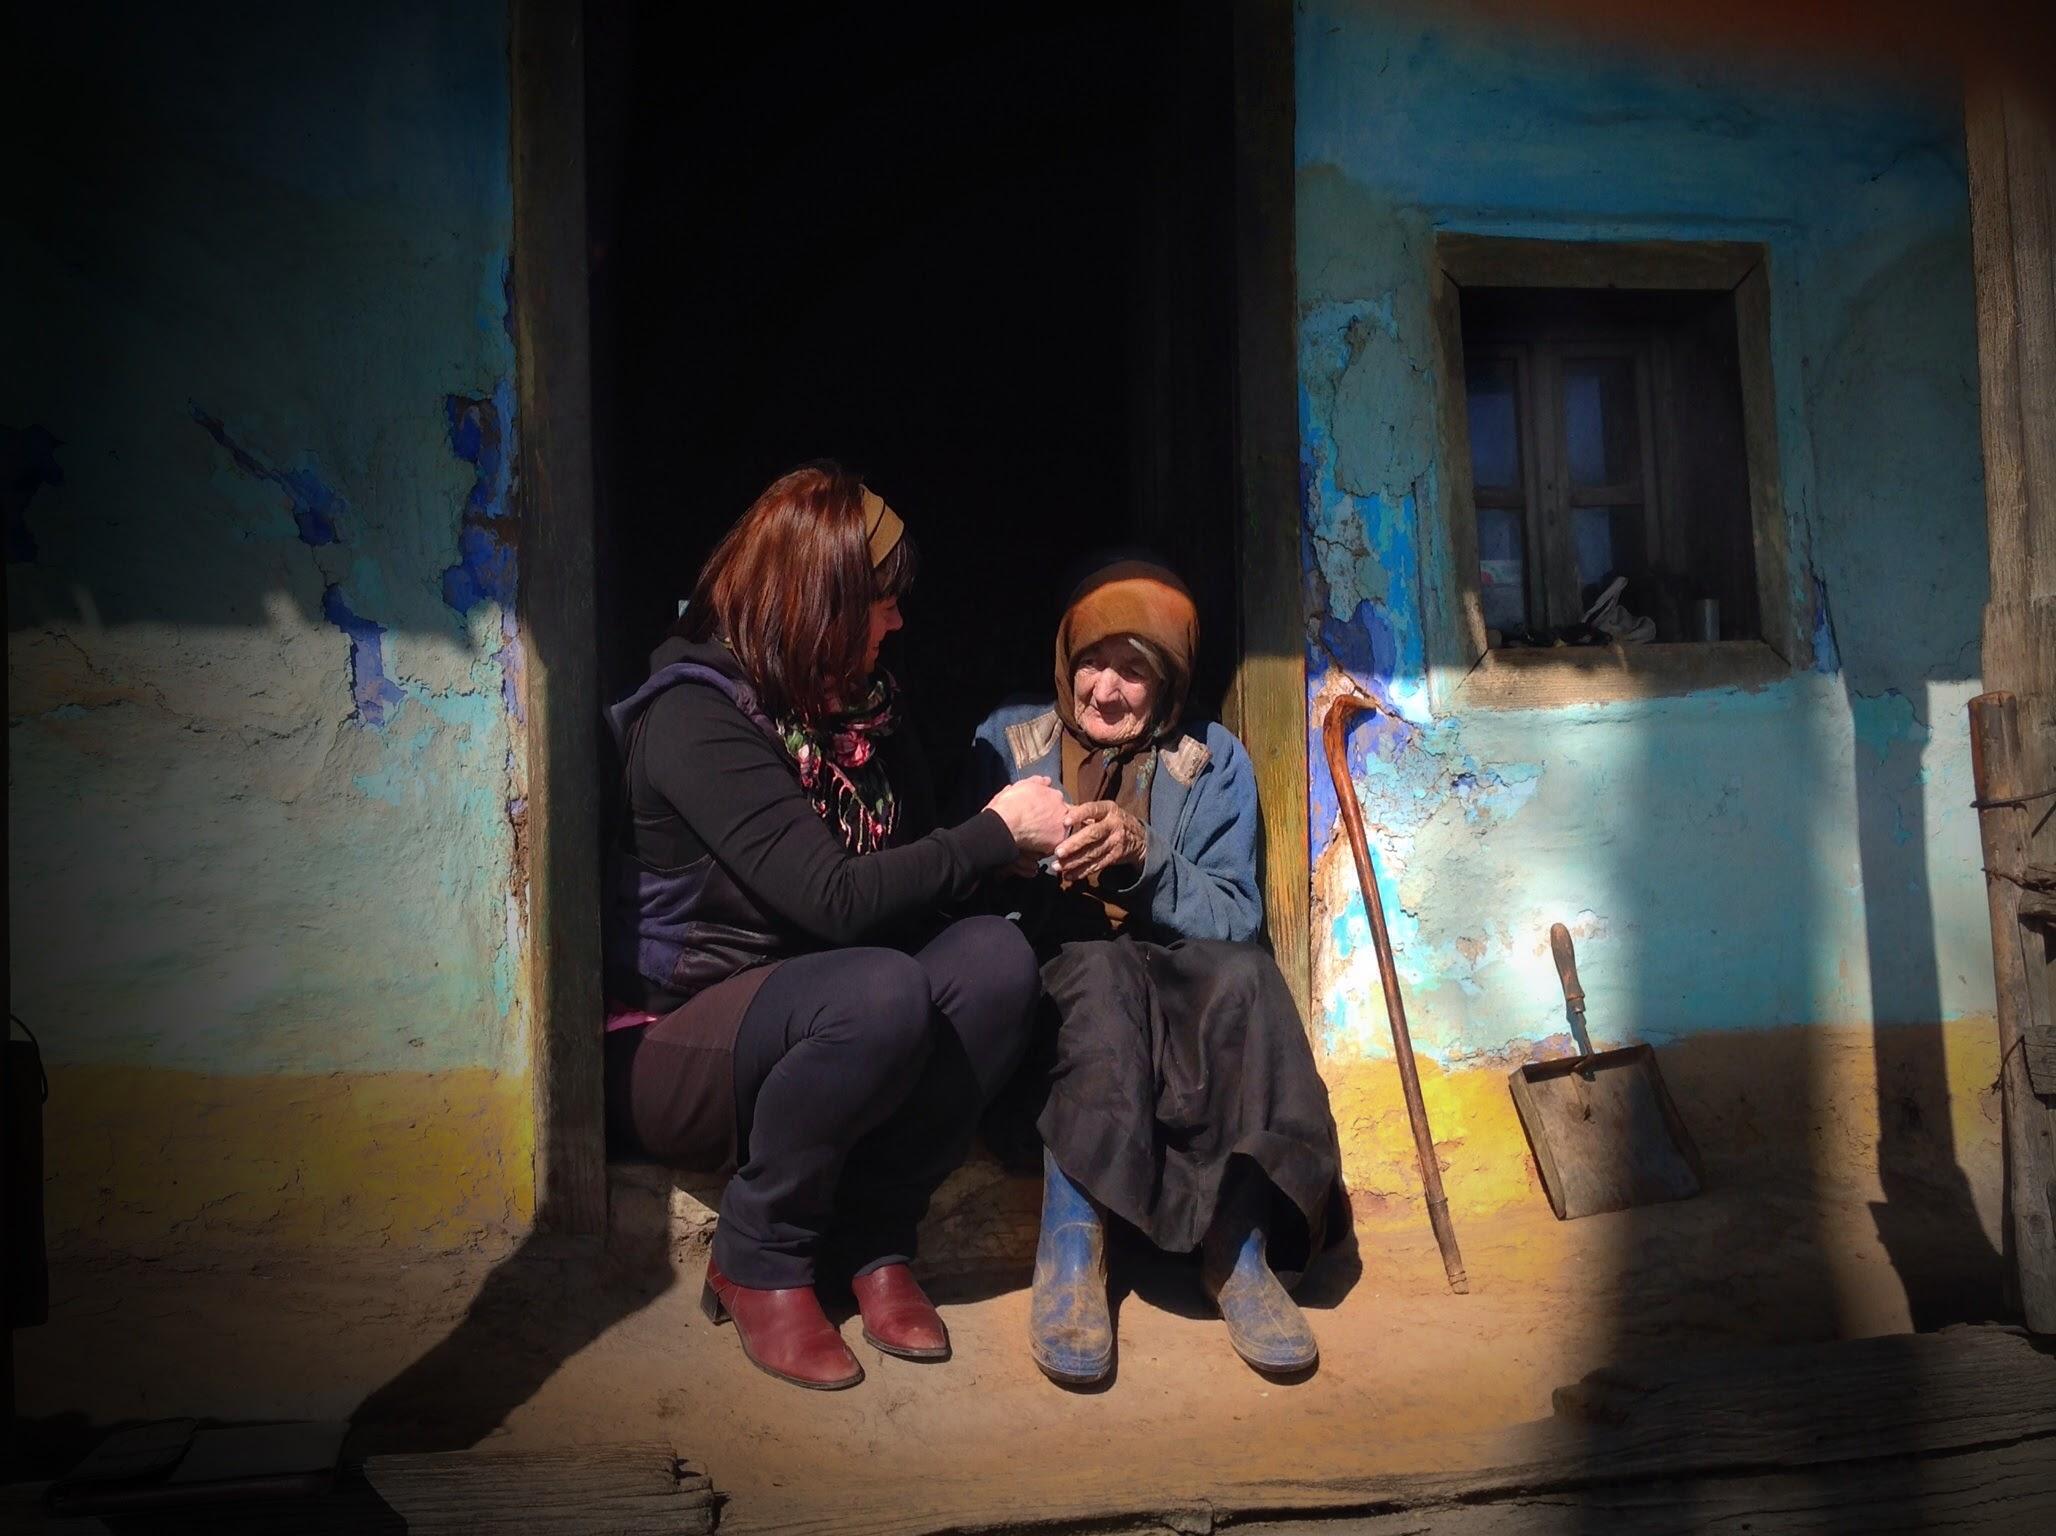 Searching for the Womens Blues, Tara Lapusului, Romania